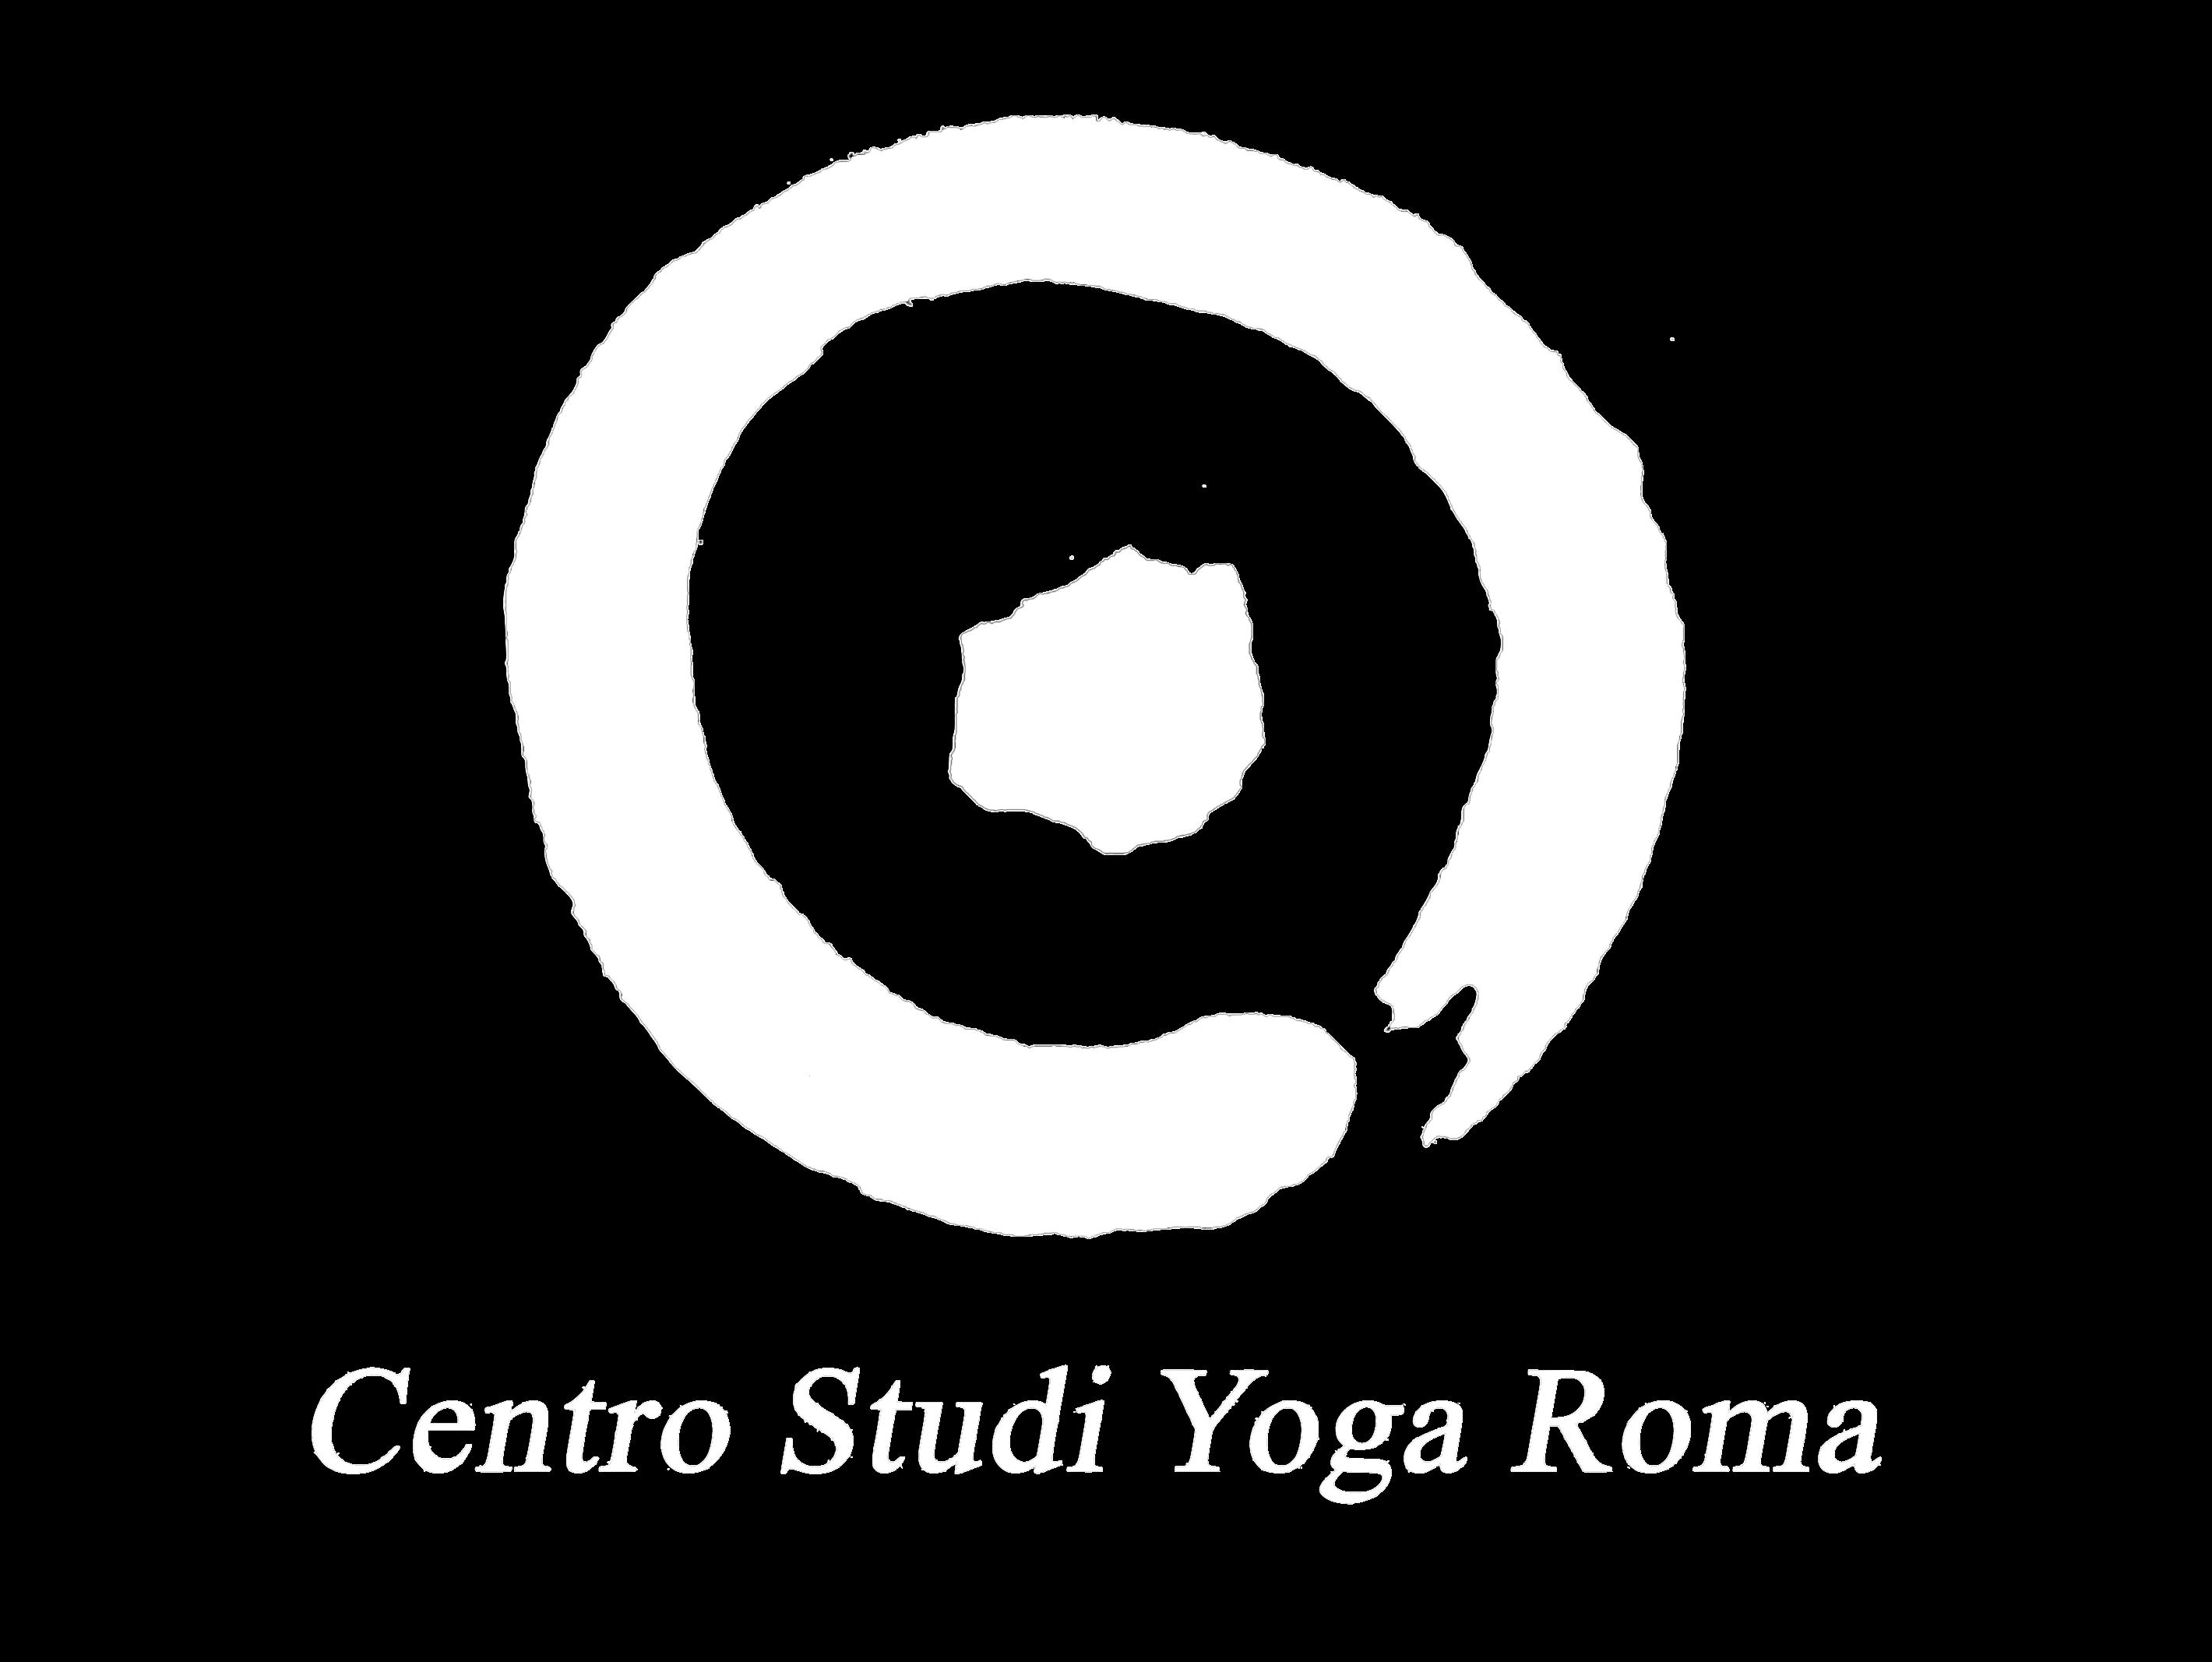 Centro studi Yoga Roma